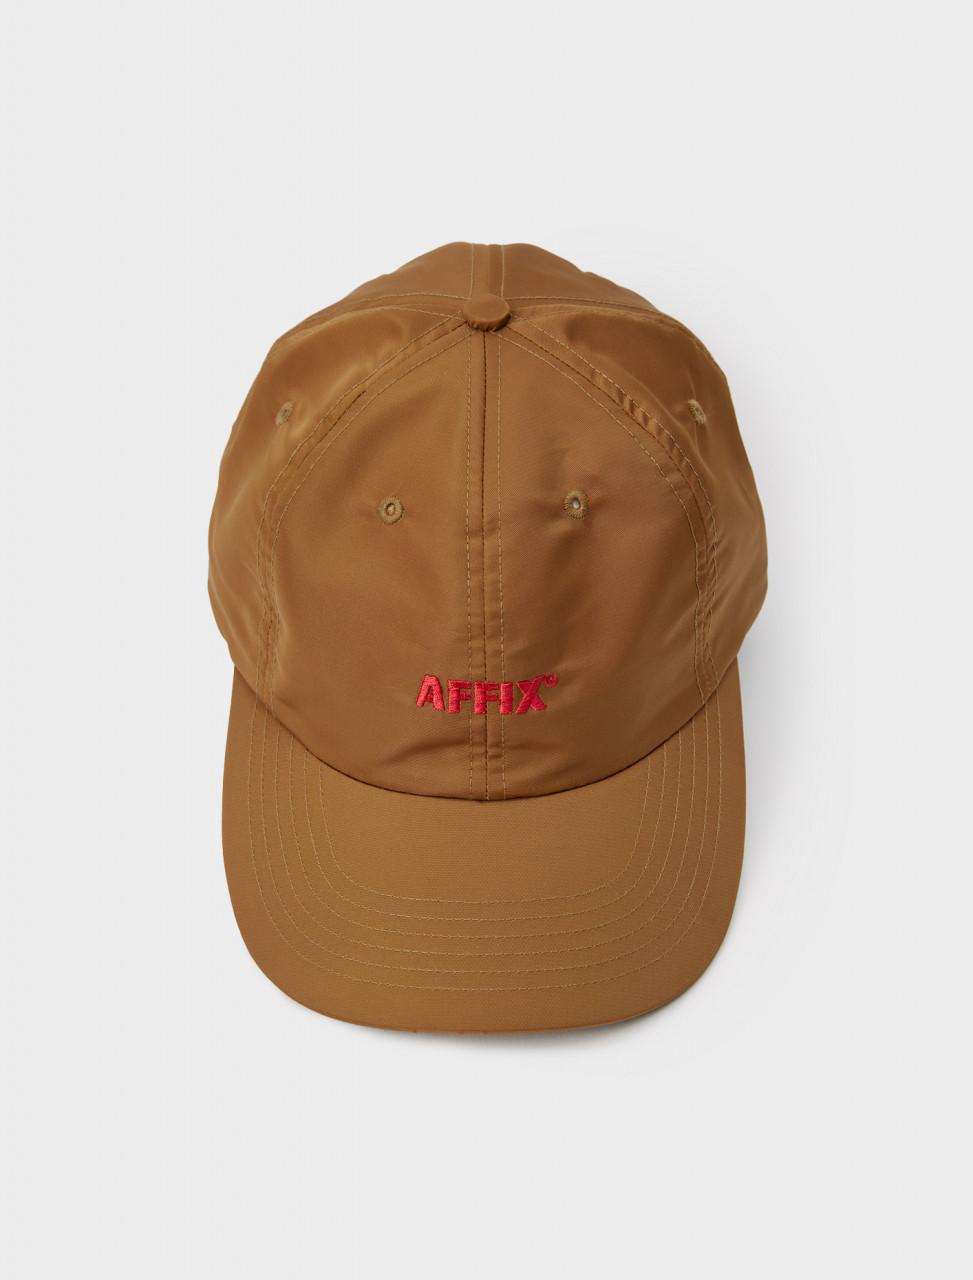 347-AW20ACC04-U AFFIX NYLON STANDARD LOGO CAP UMBER